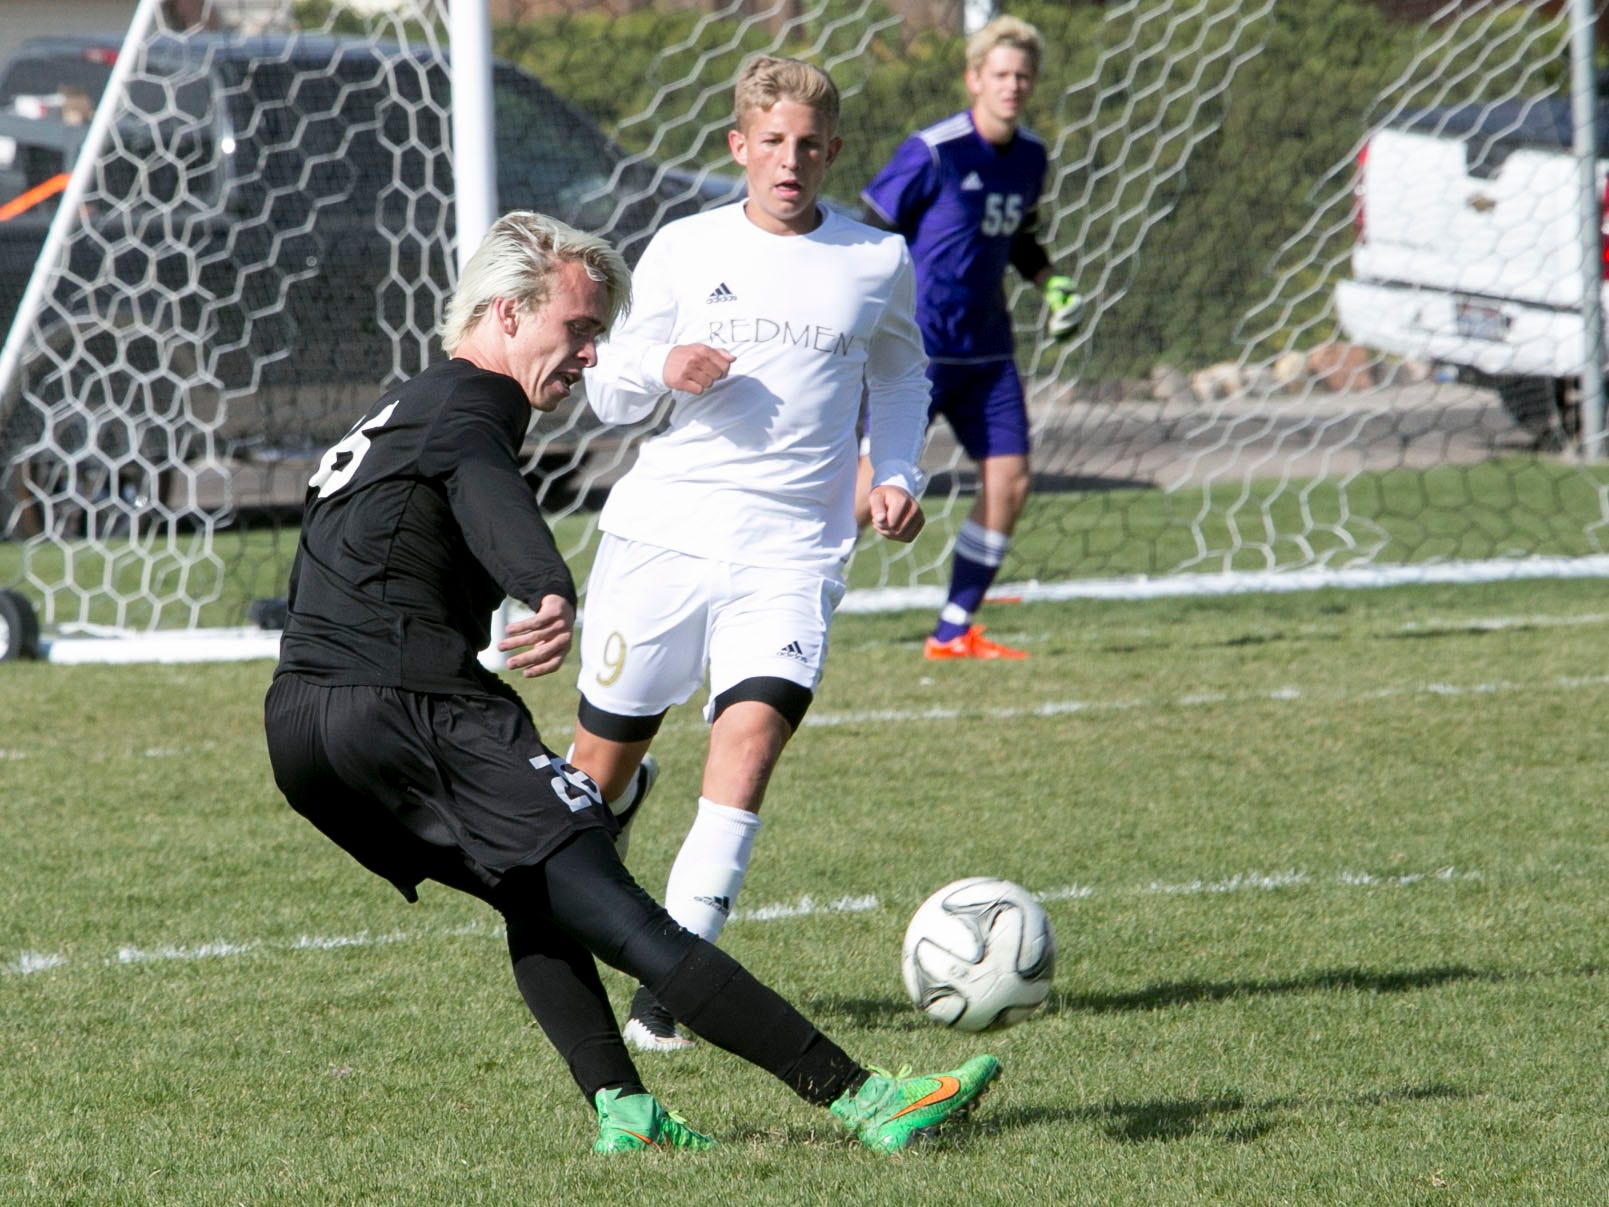 Desert Hills' Kanon Heaton scores against Cedar's Andrew Boyer on Friday at Cedar High School.